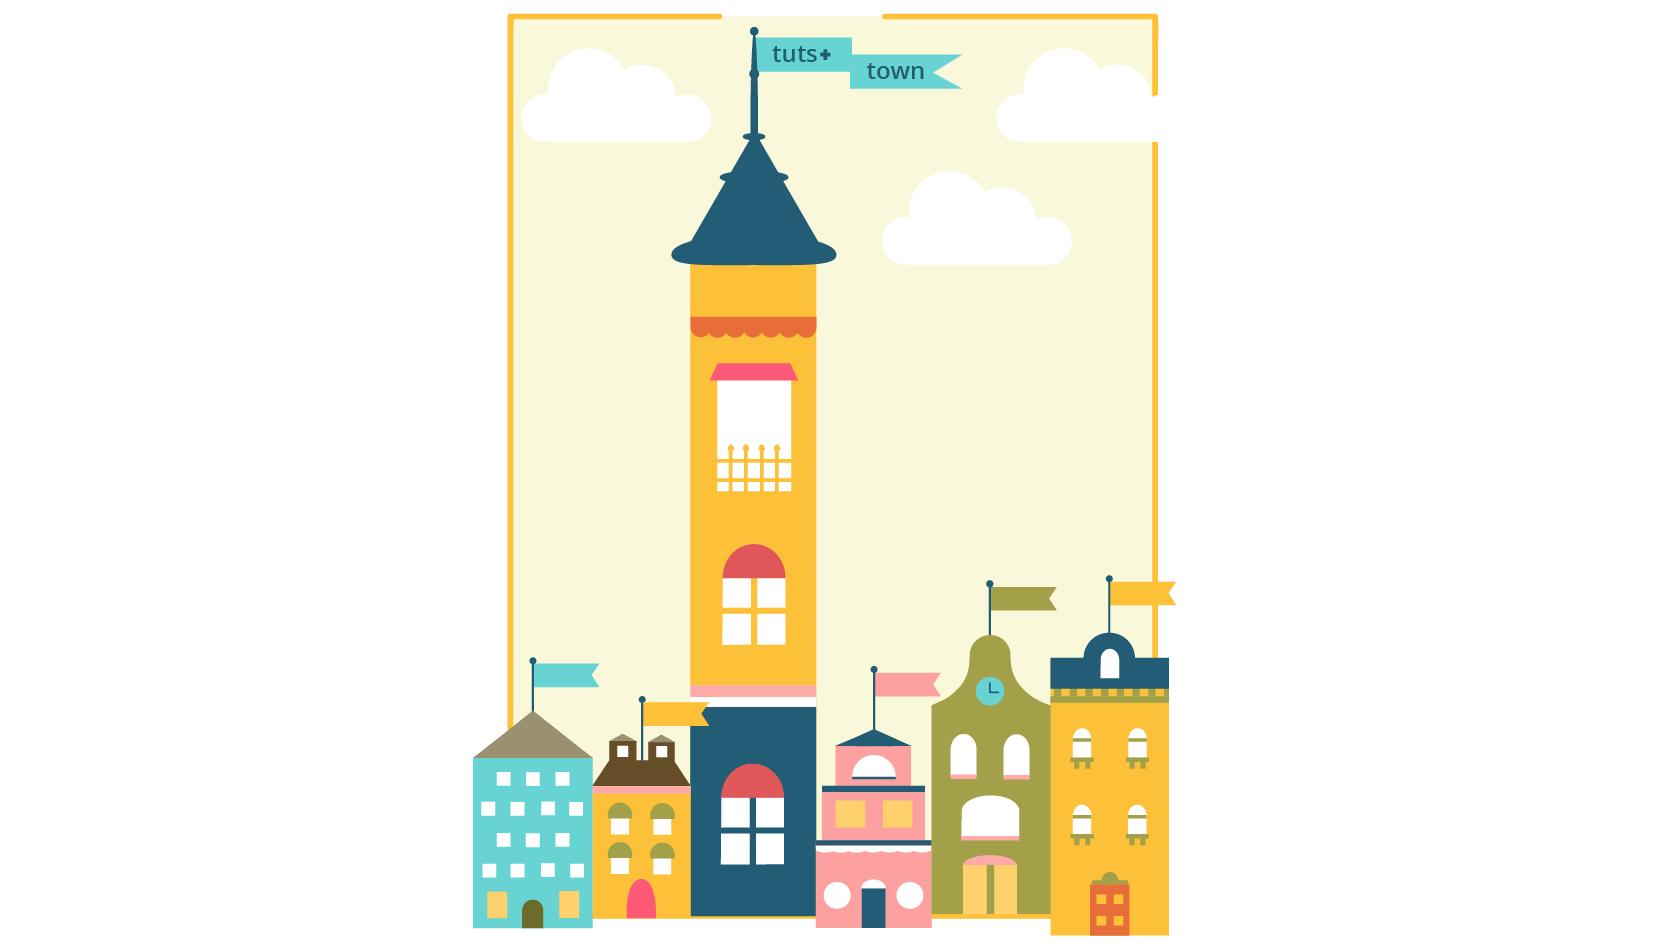 Tuts+ Town building illustration